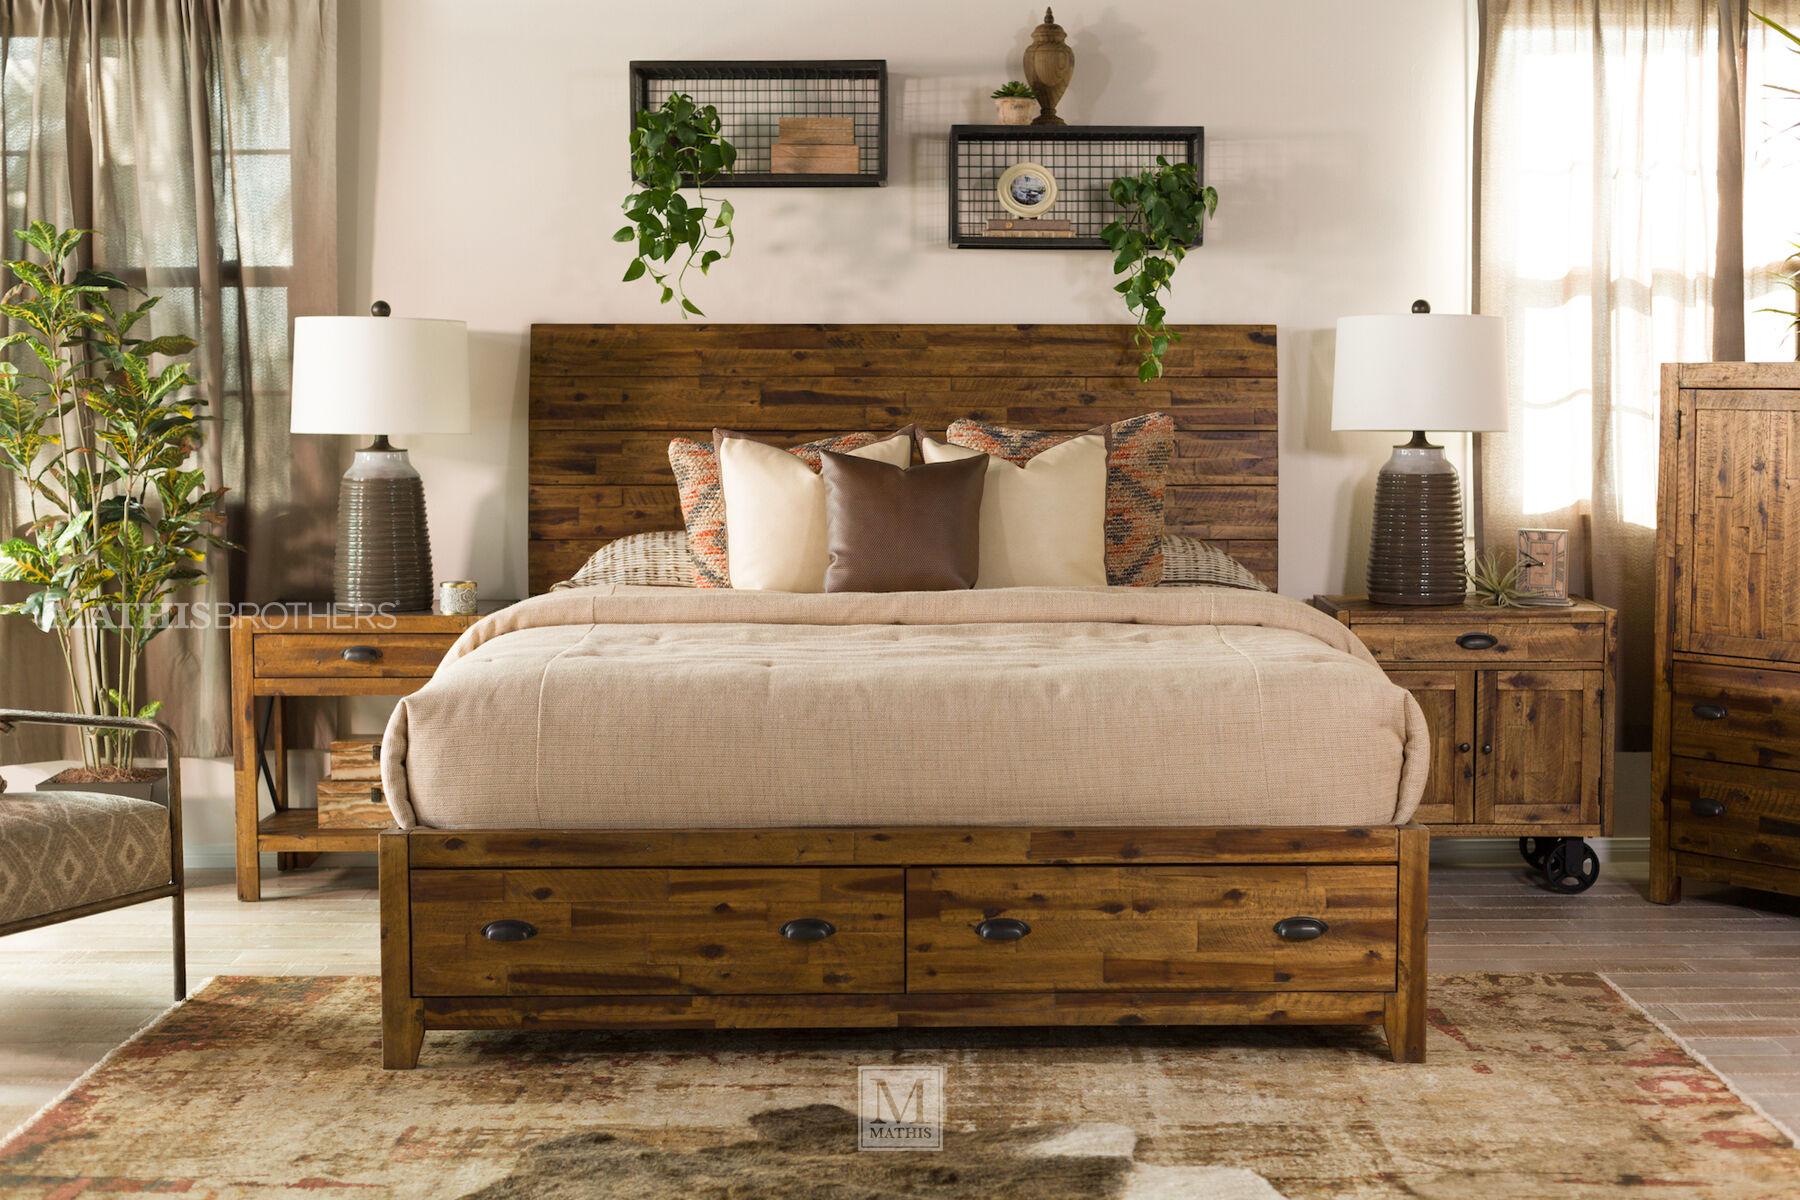 Impressive Country Bedroom Sets Minimalist